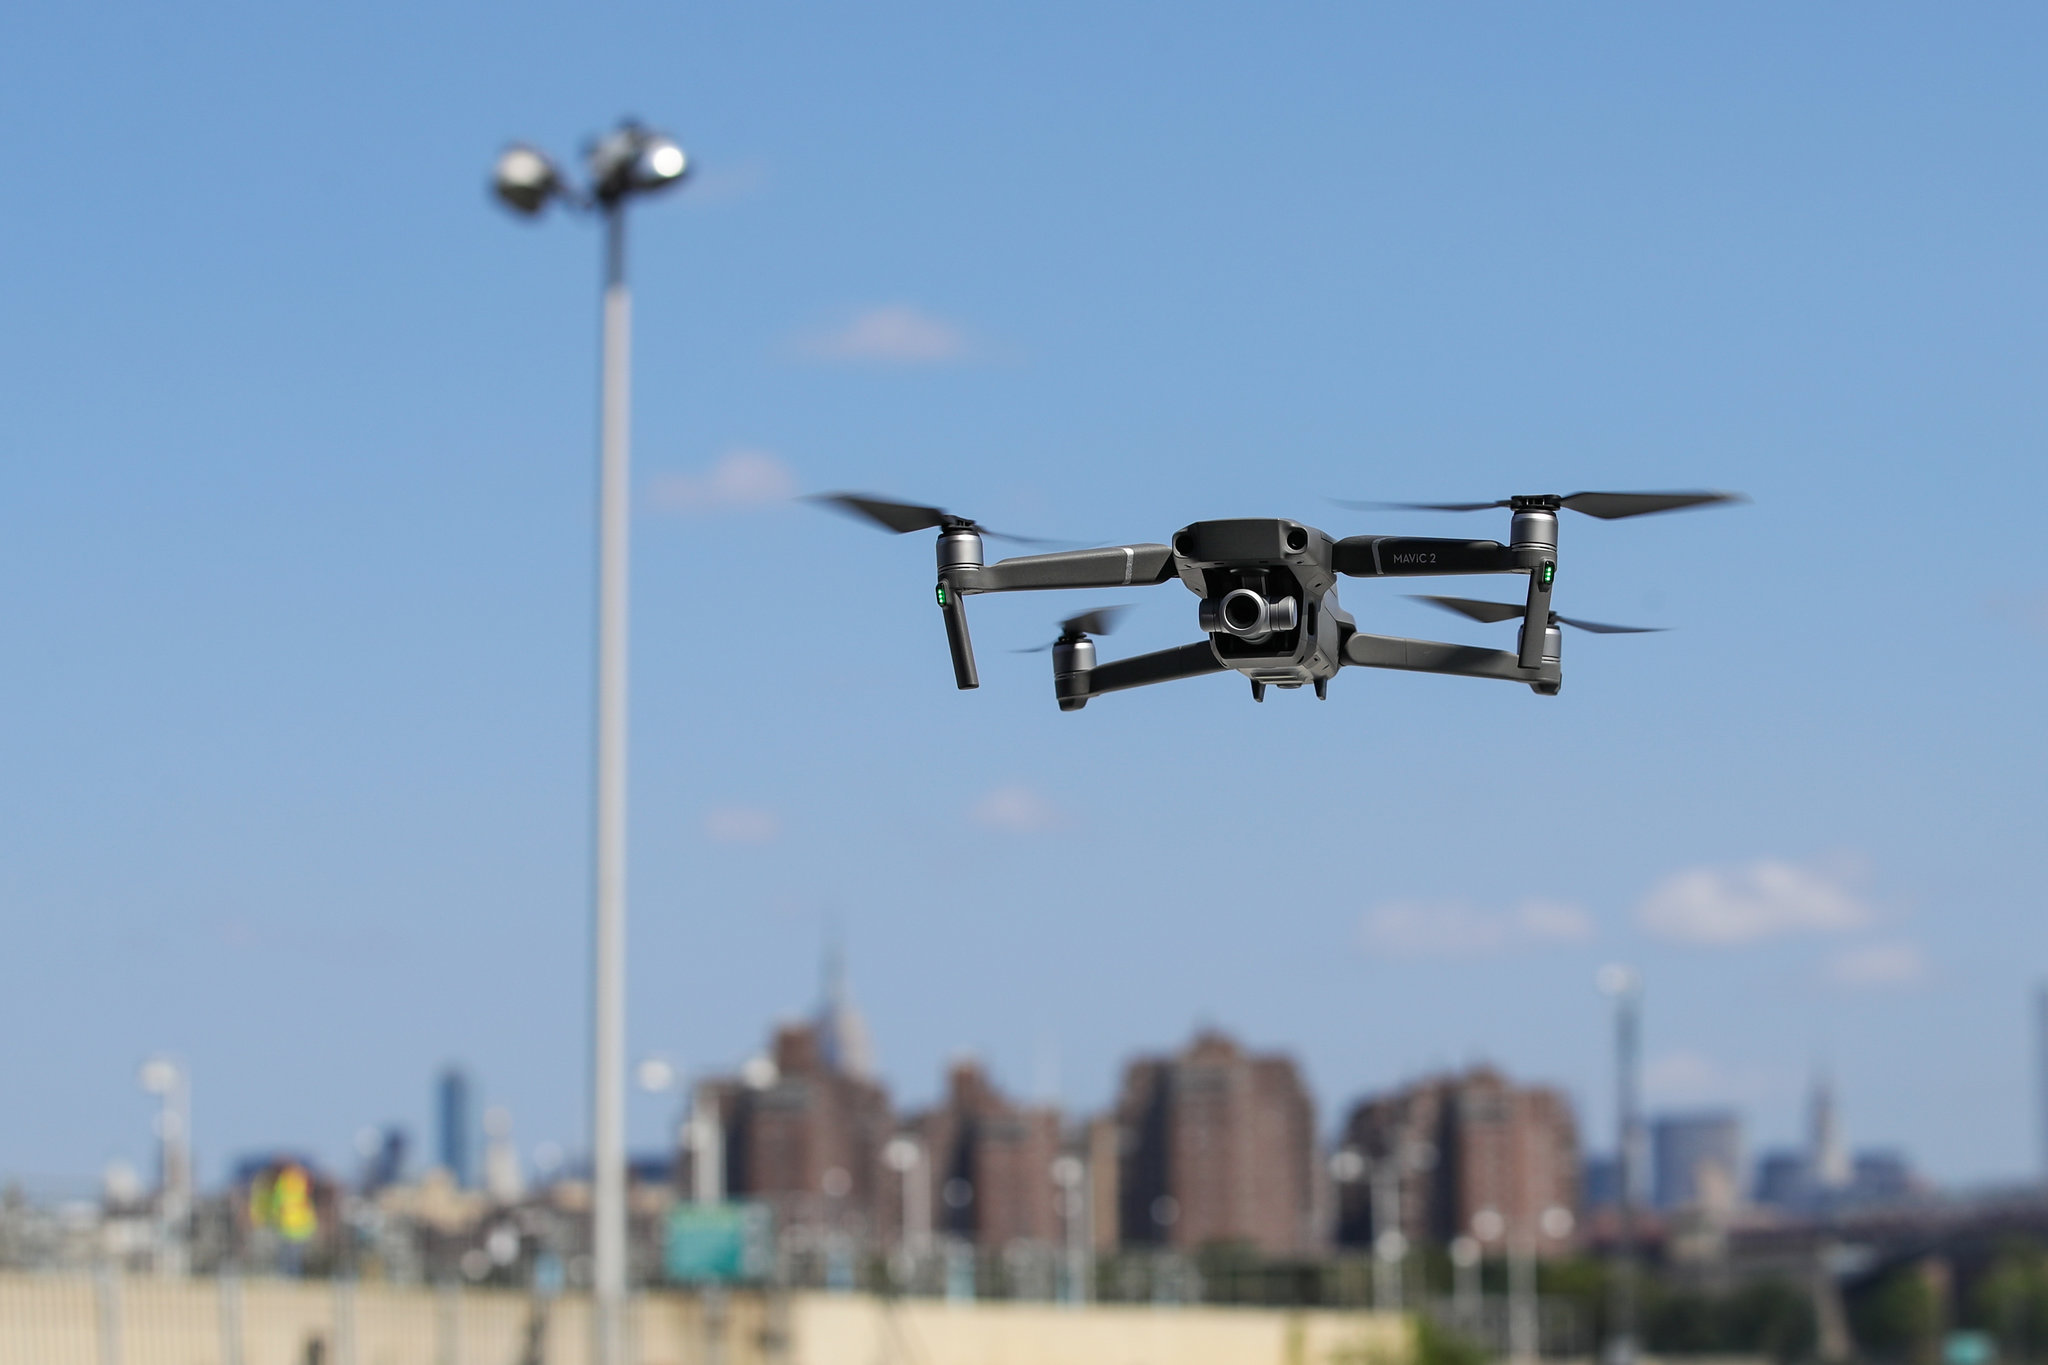 Dept of Interior drone use